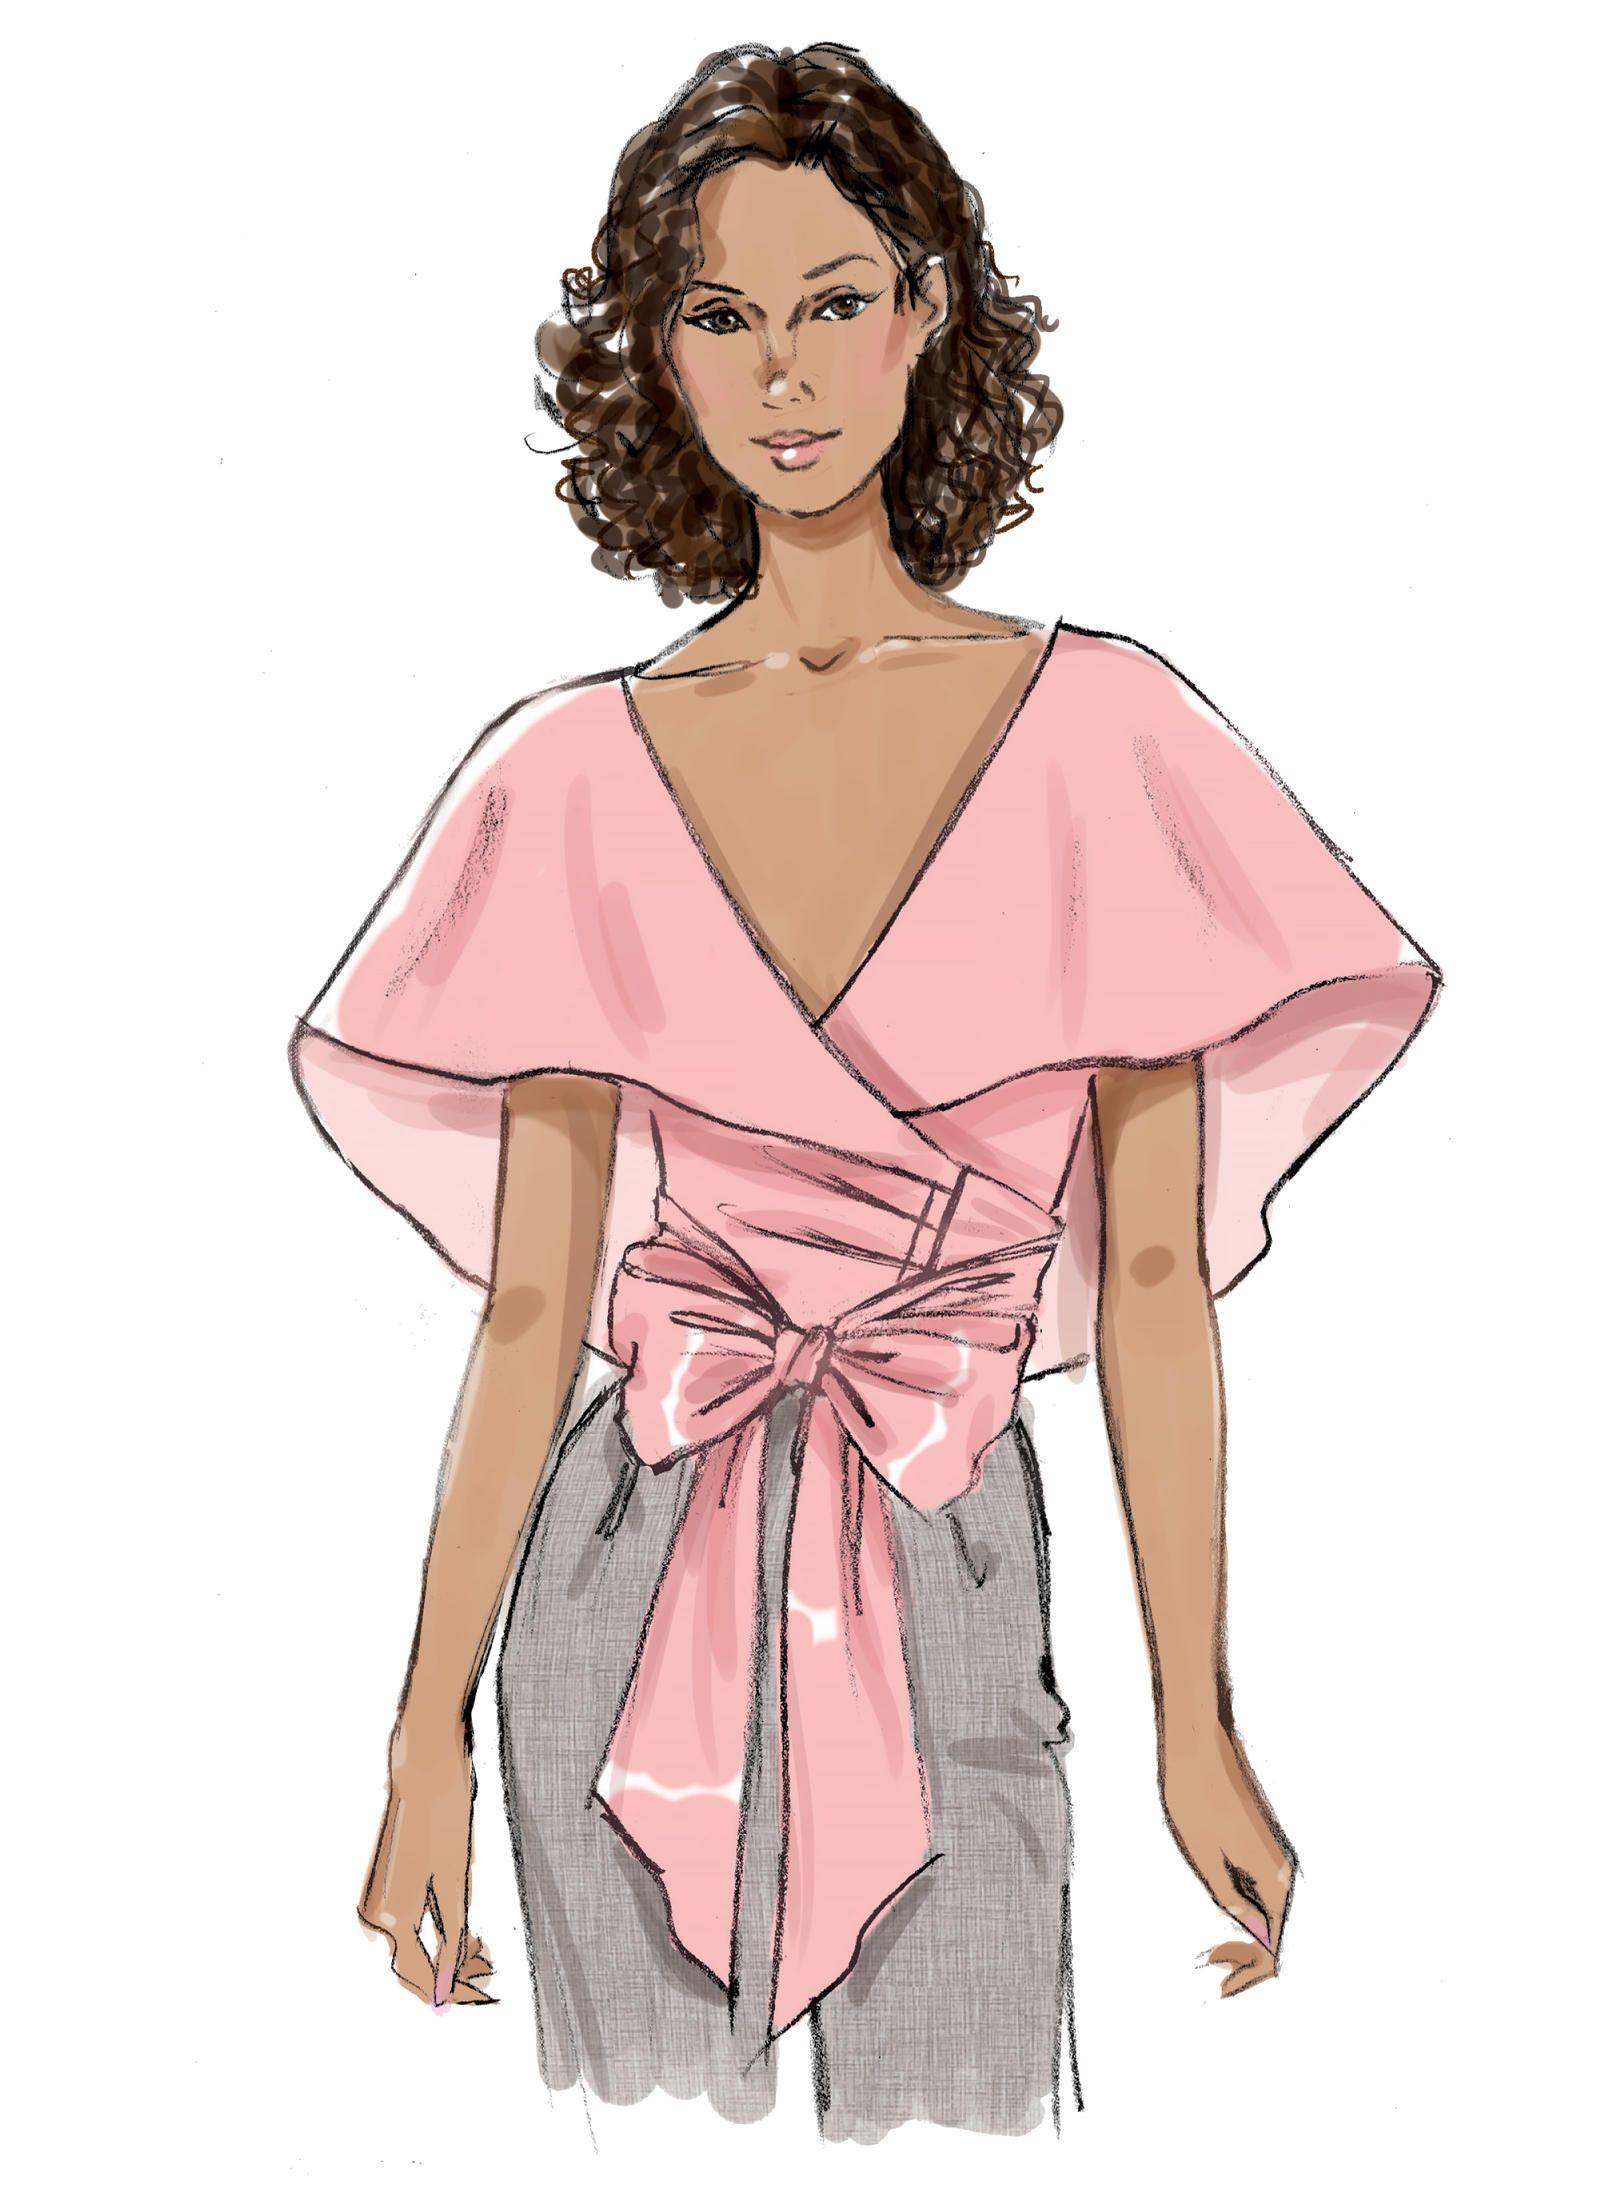 V9315 | Vogue Patterns | Sewing Patterns | Vogue patterns ...